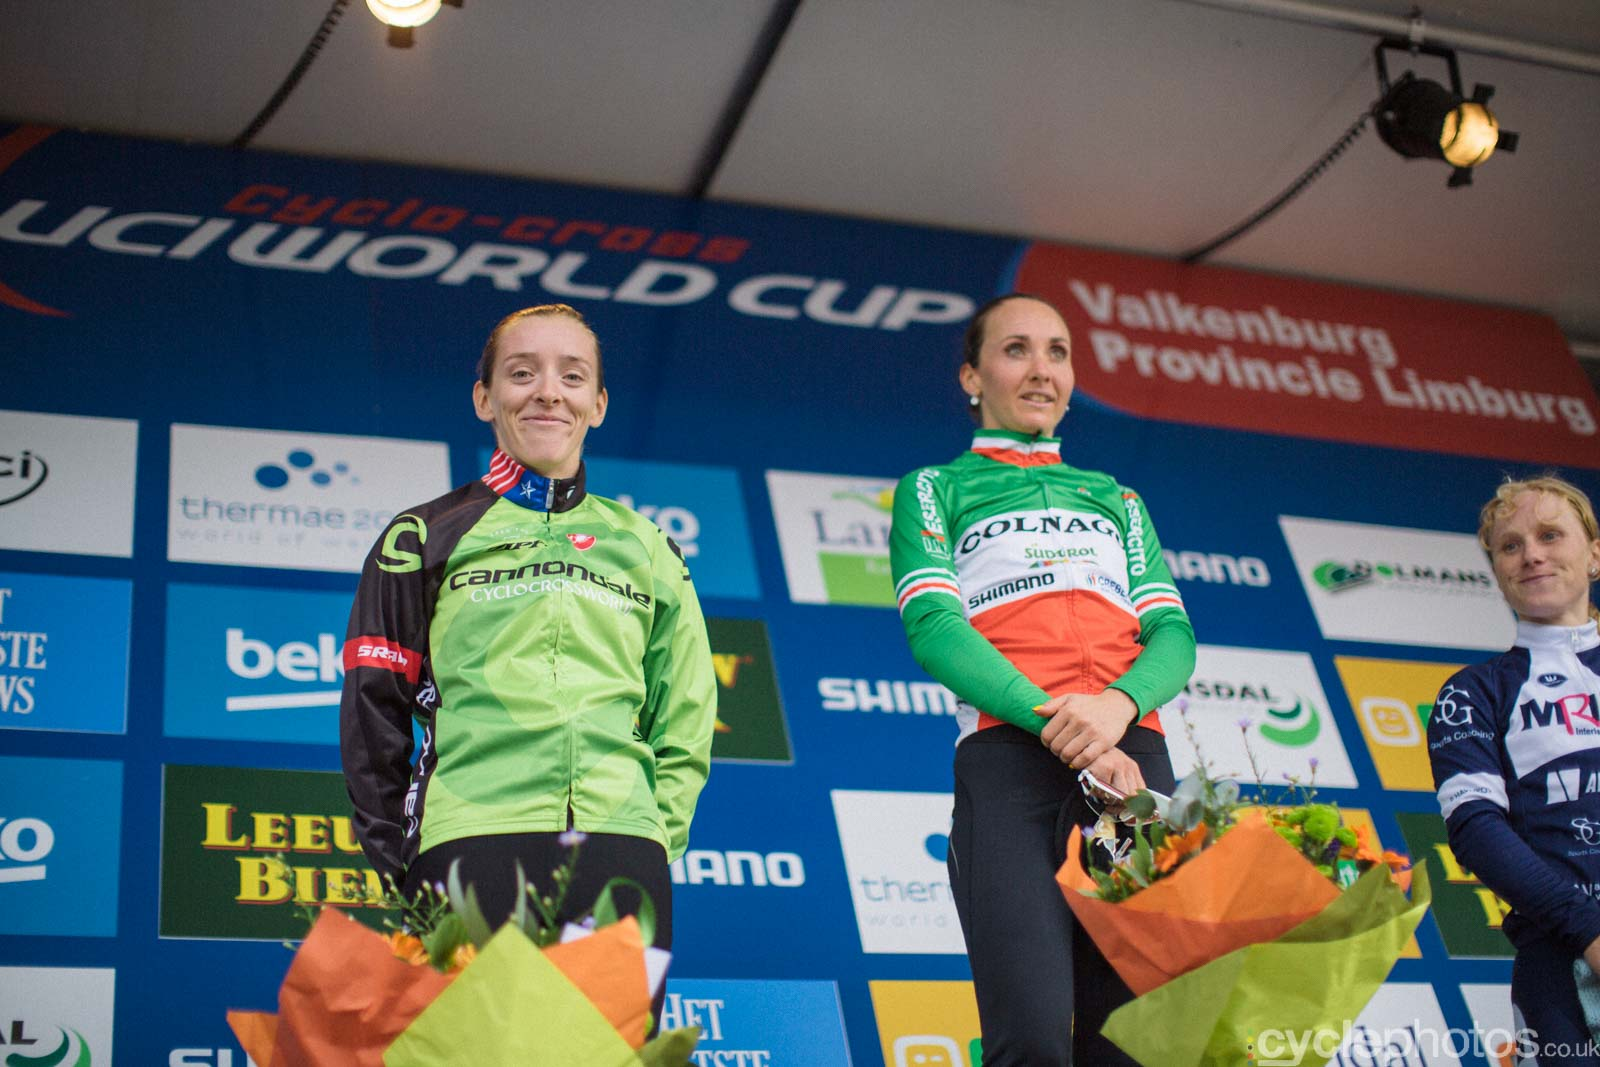 2015-cyclephotos-cyclocross-valkenburg-143055-kaitie-antonneau